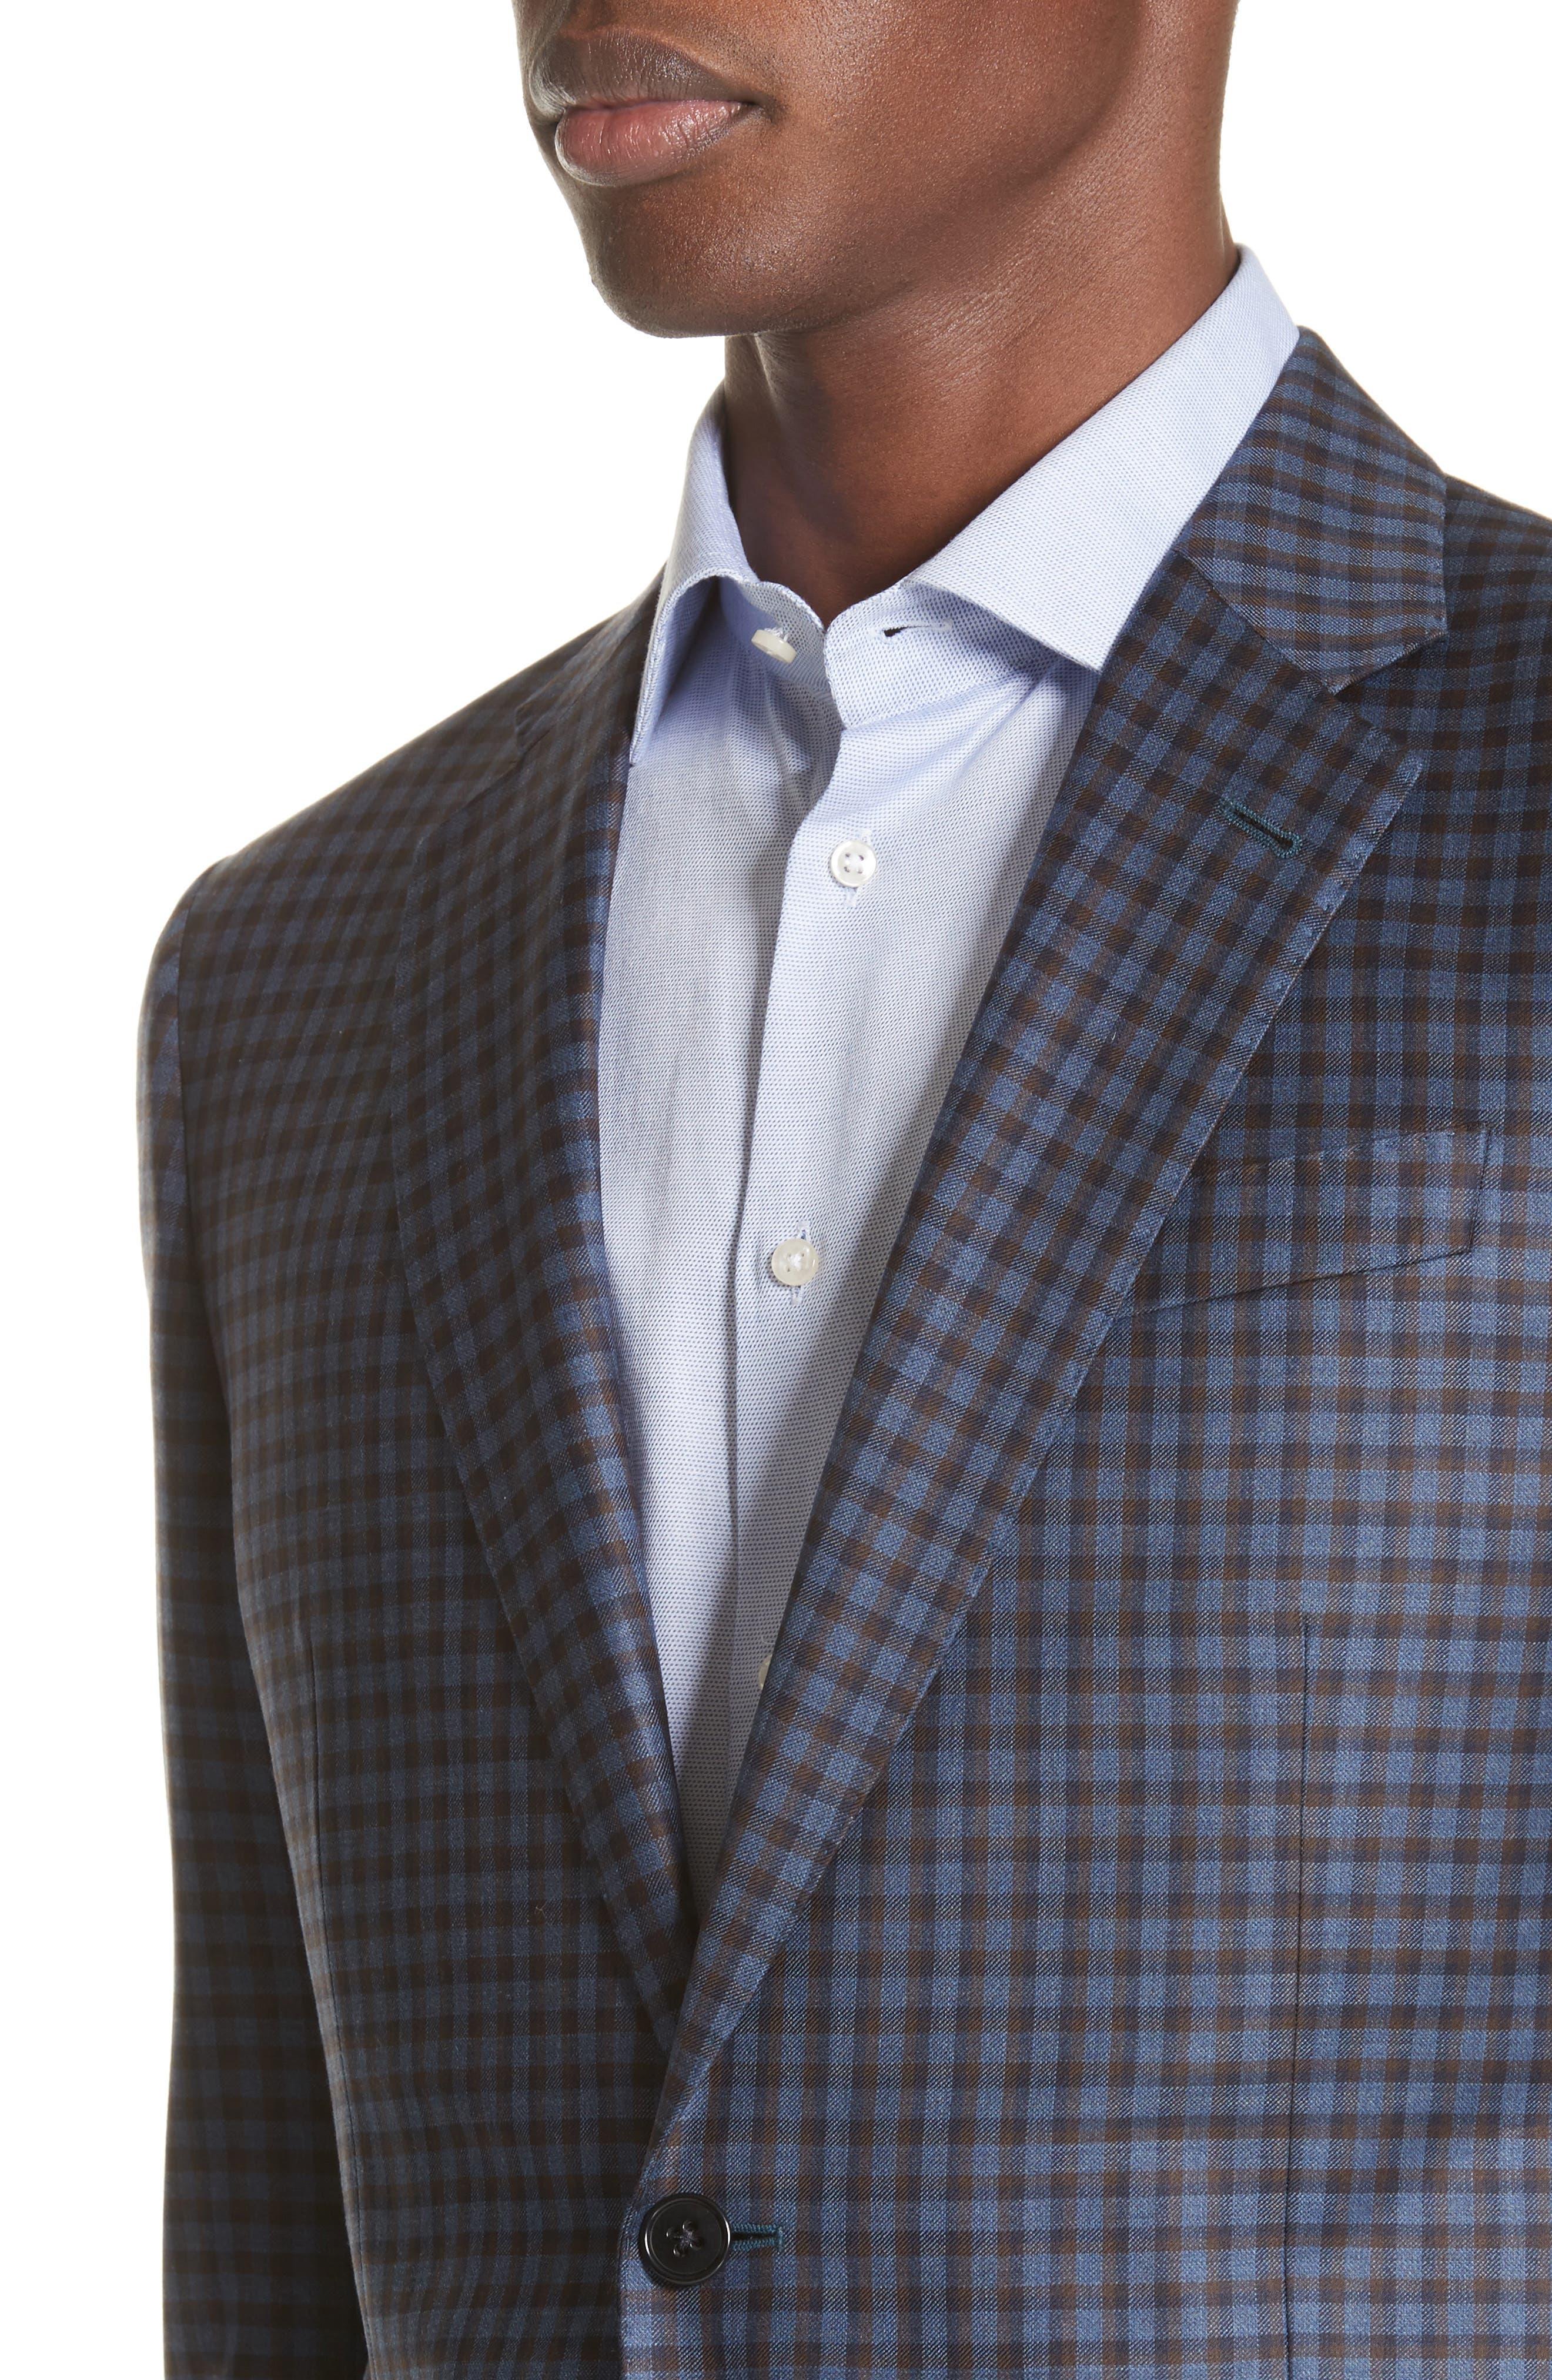 G Line Trim Fit Check Wool Sport Coat,                             Alternate thumbnail 4, color,                             443